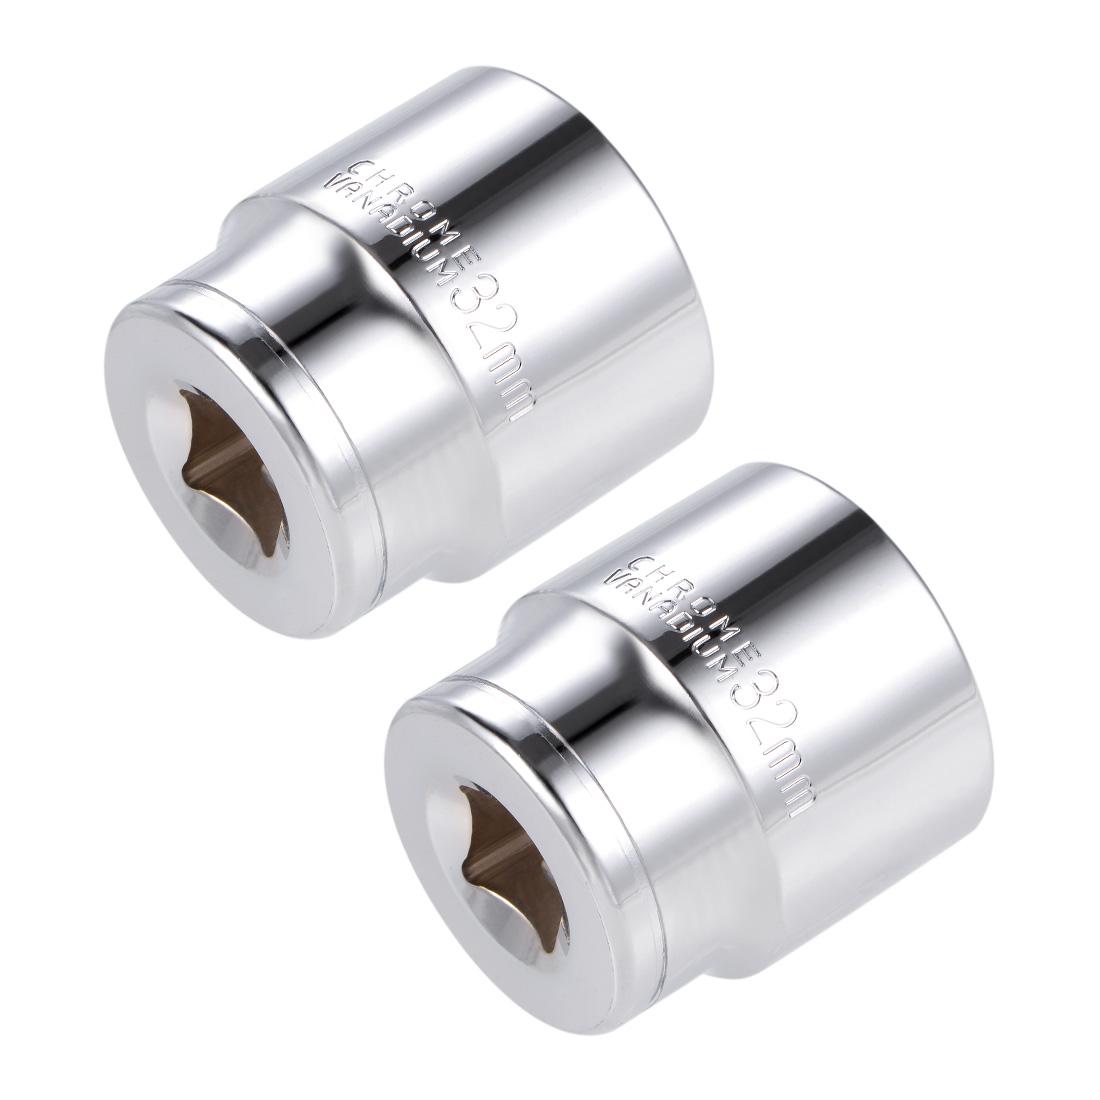 1/2-inch Drive E32 Universal Spline Socket Shallow 12 Point Cr-V Steel 2 pcs